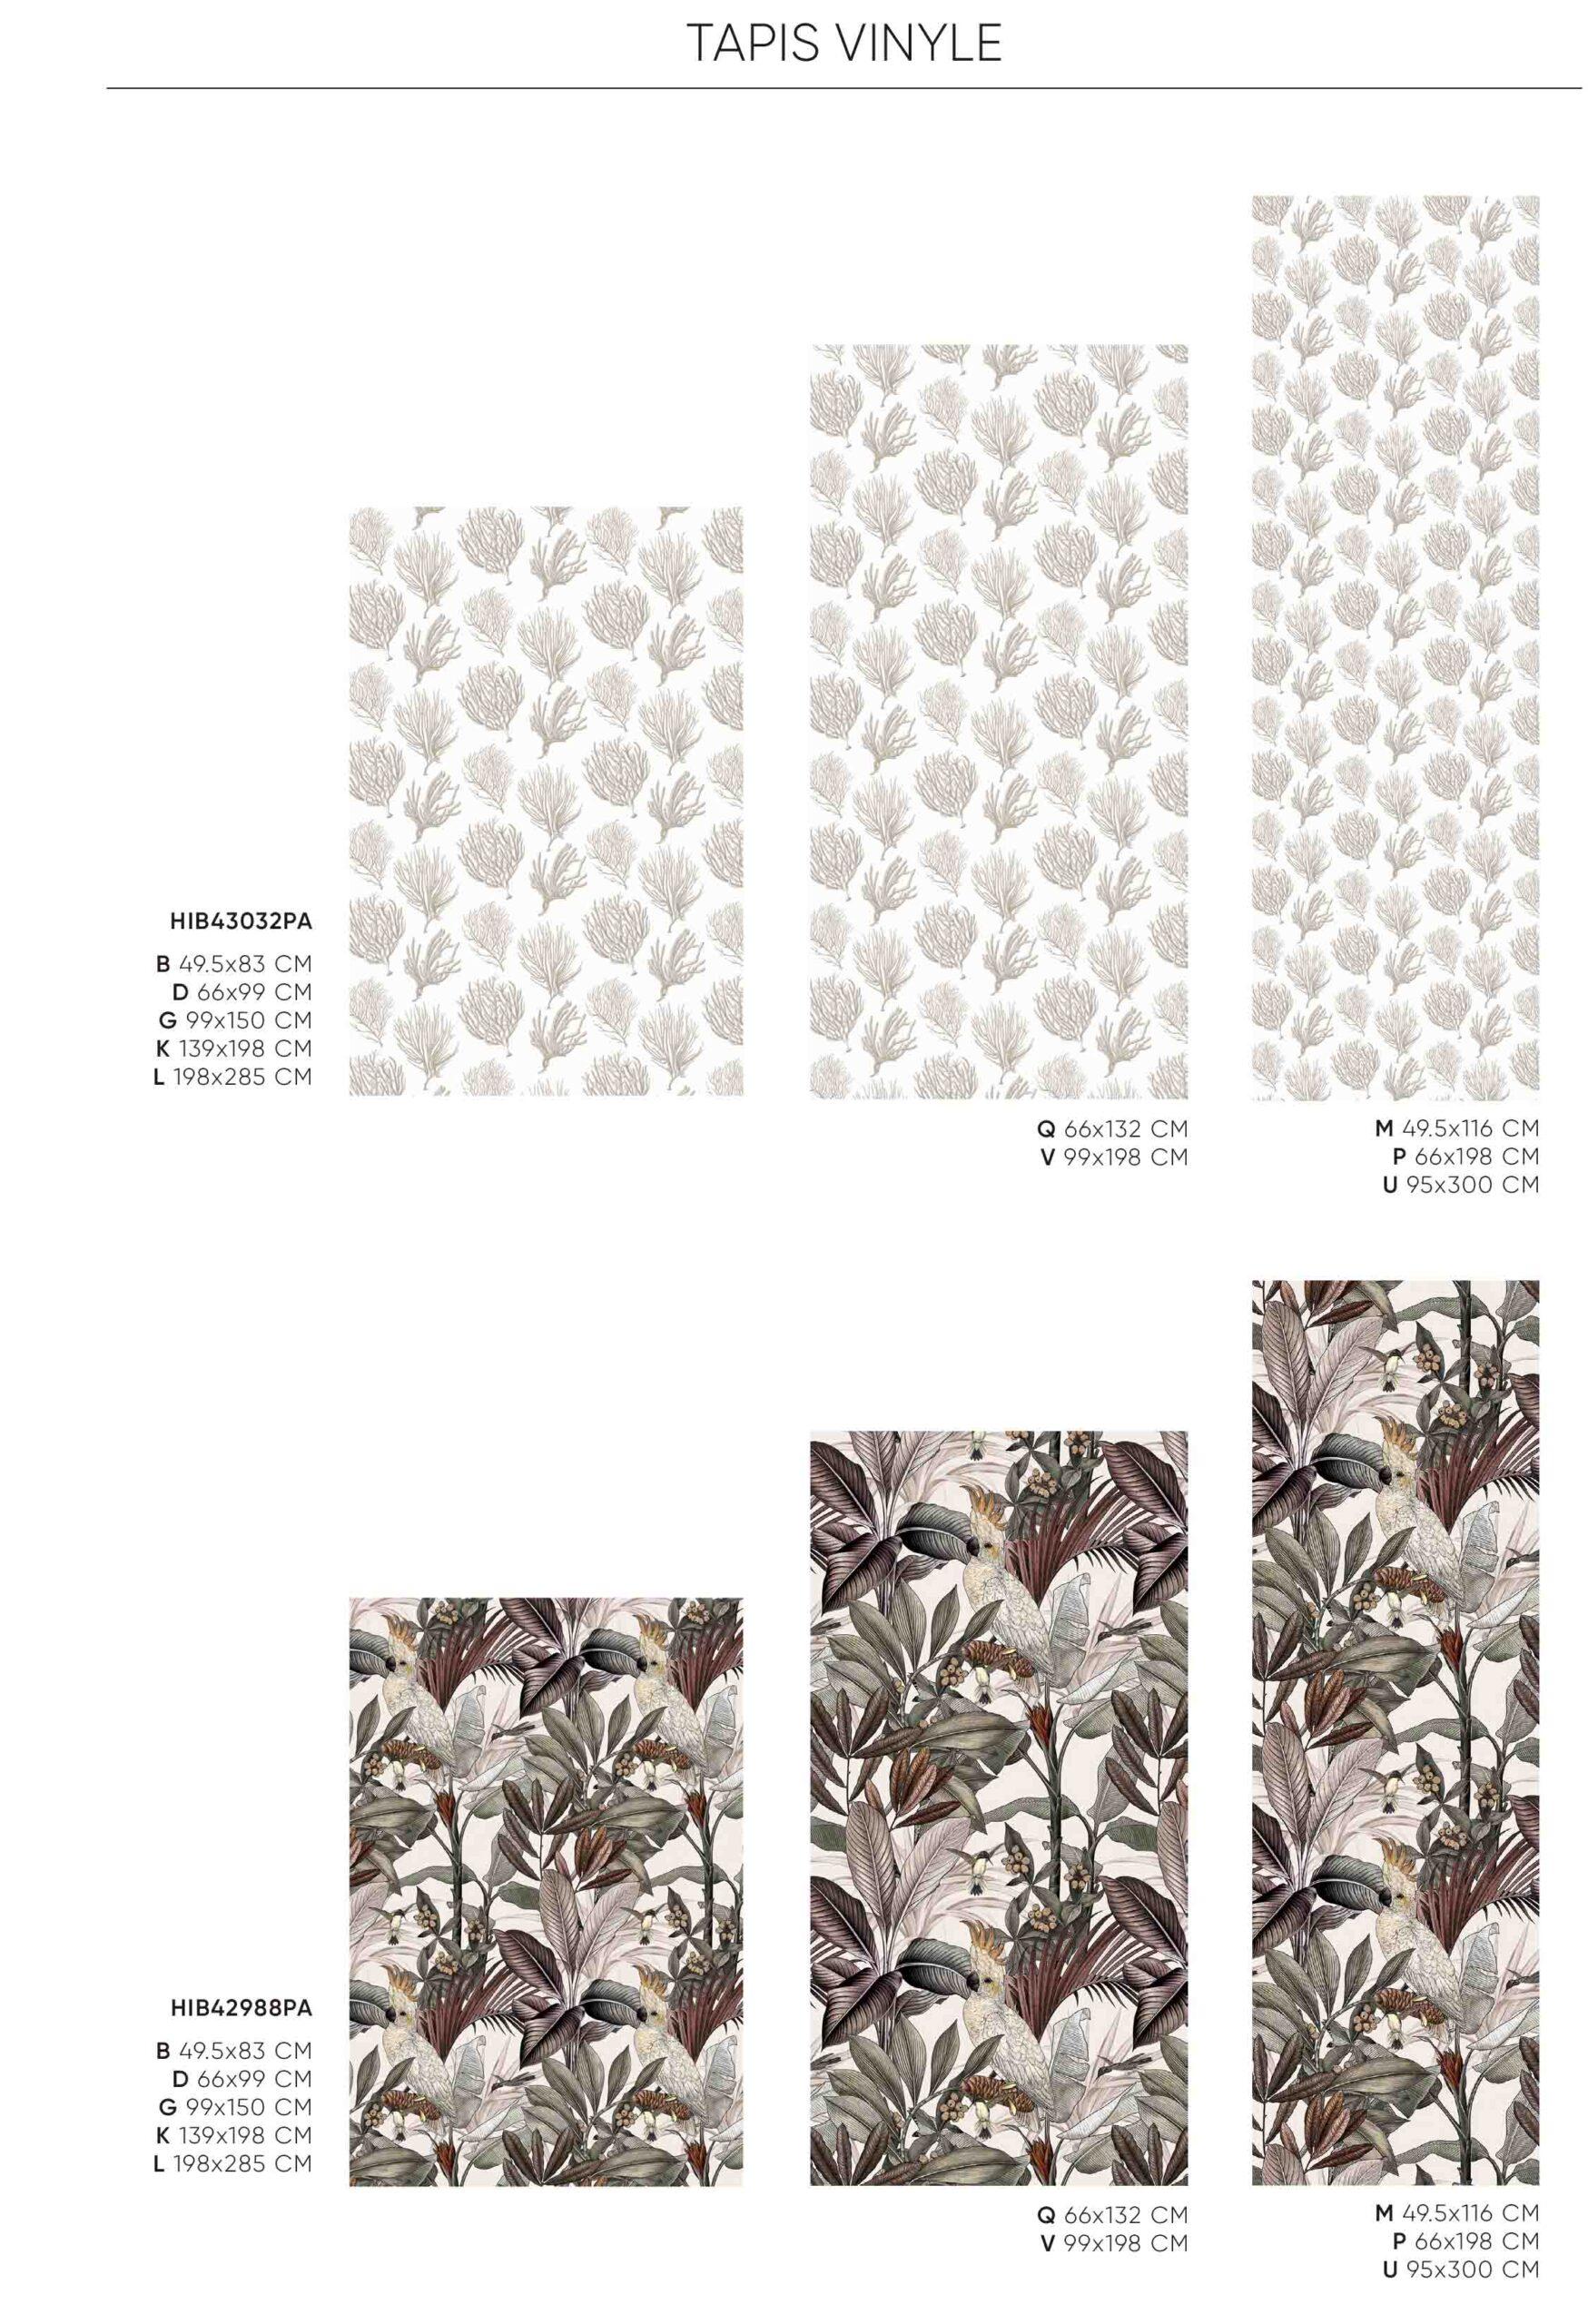 alfombra exterior ibiza c5 6